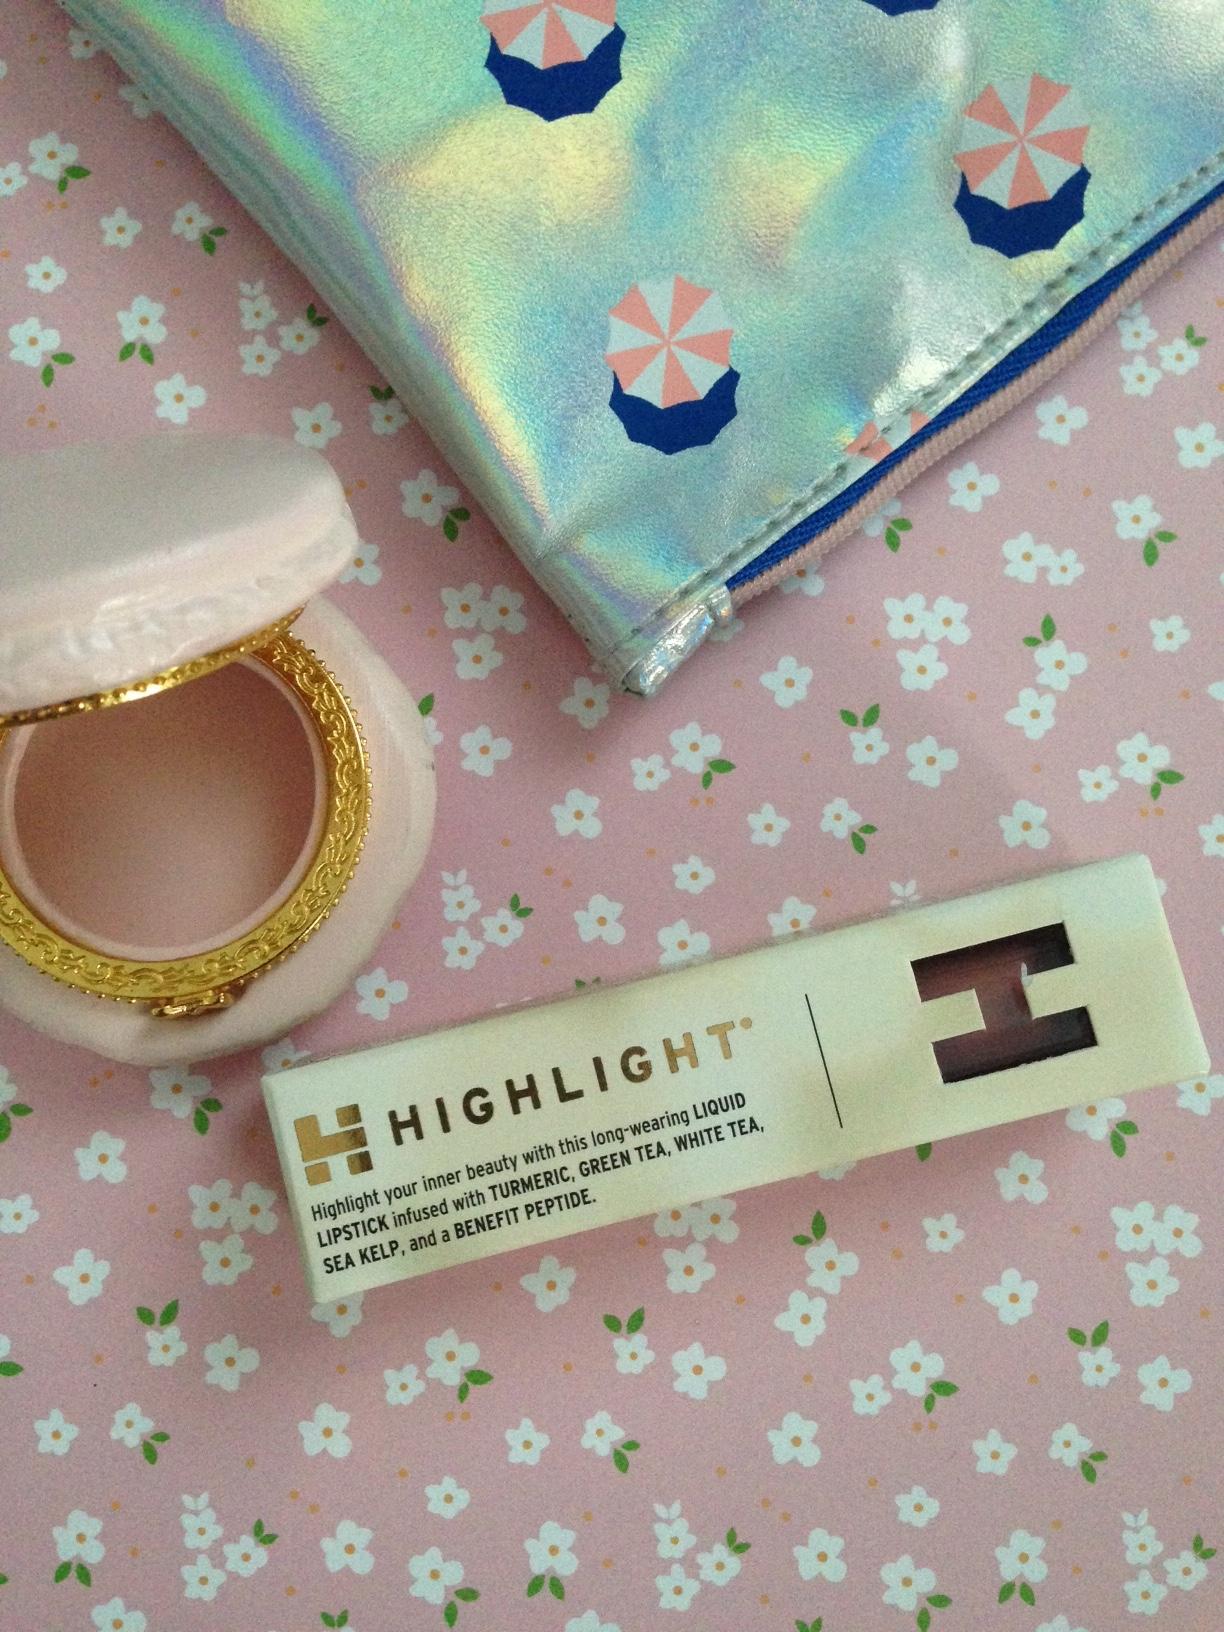 Highlight Liquid Lipstick box neversaydiebeauty.com @redAllison